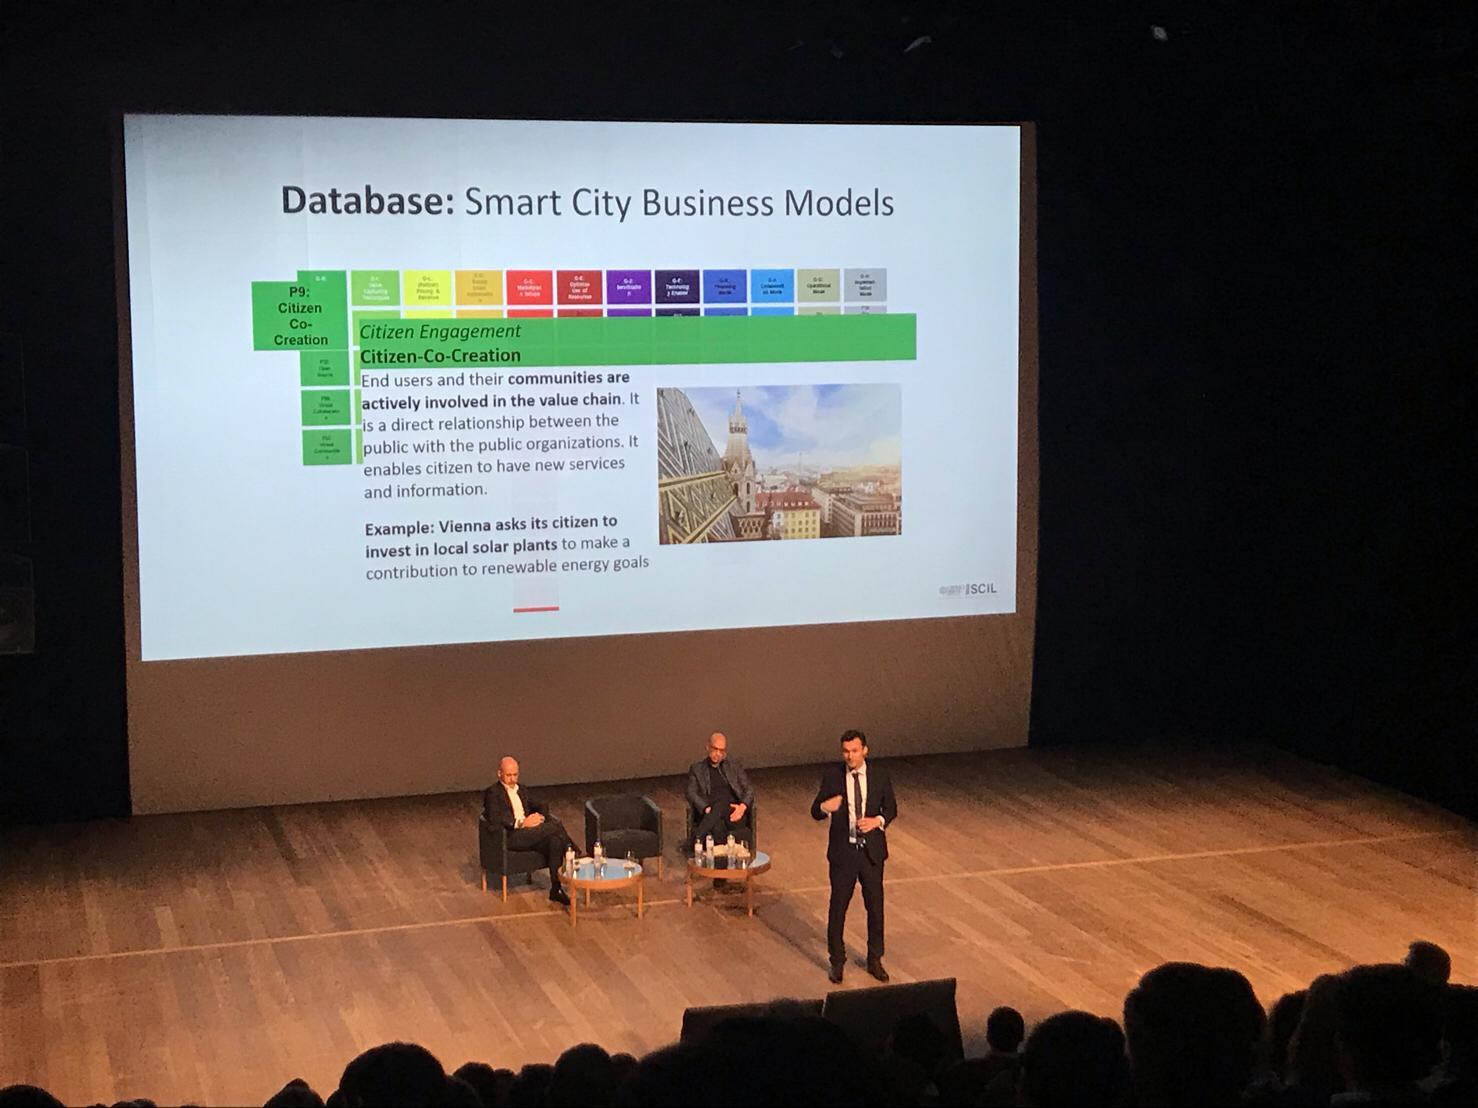 Smart City Business Models